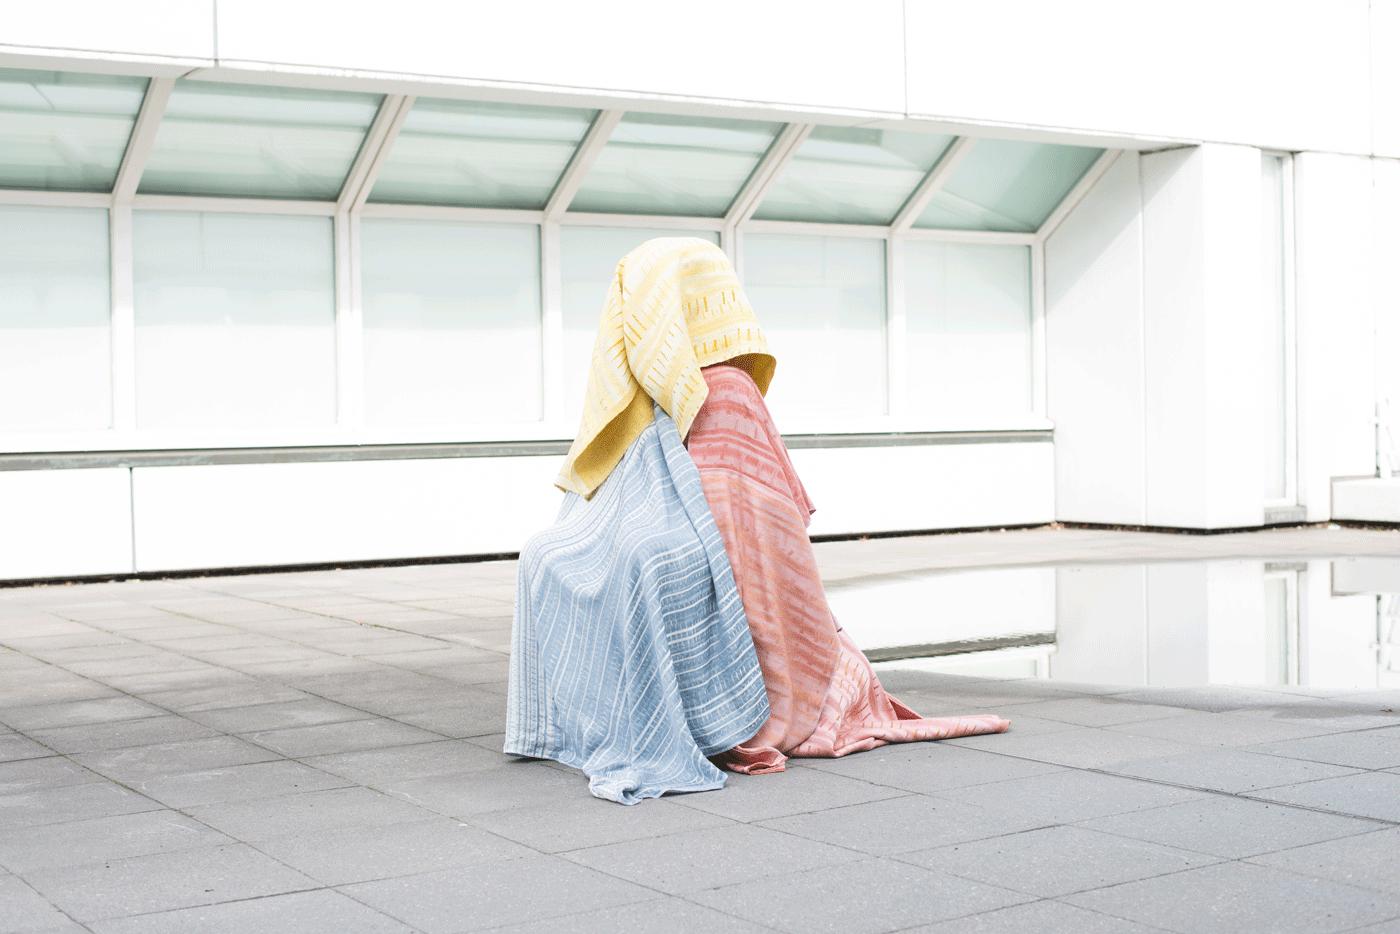 Foto_Annemie-J.Martin/ Charlott Cobler_Textildesign_pape